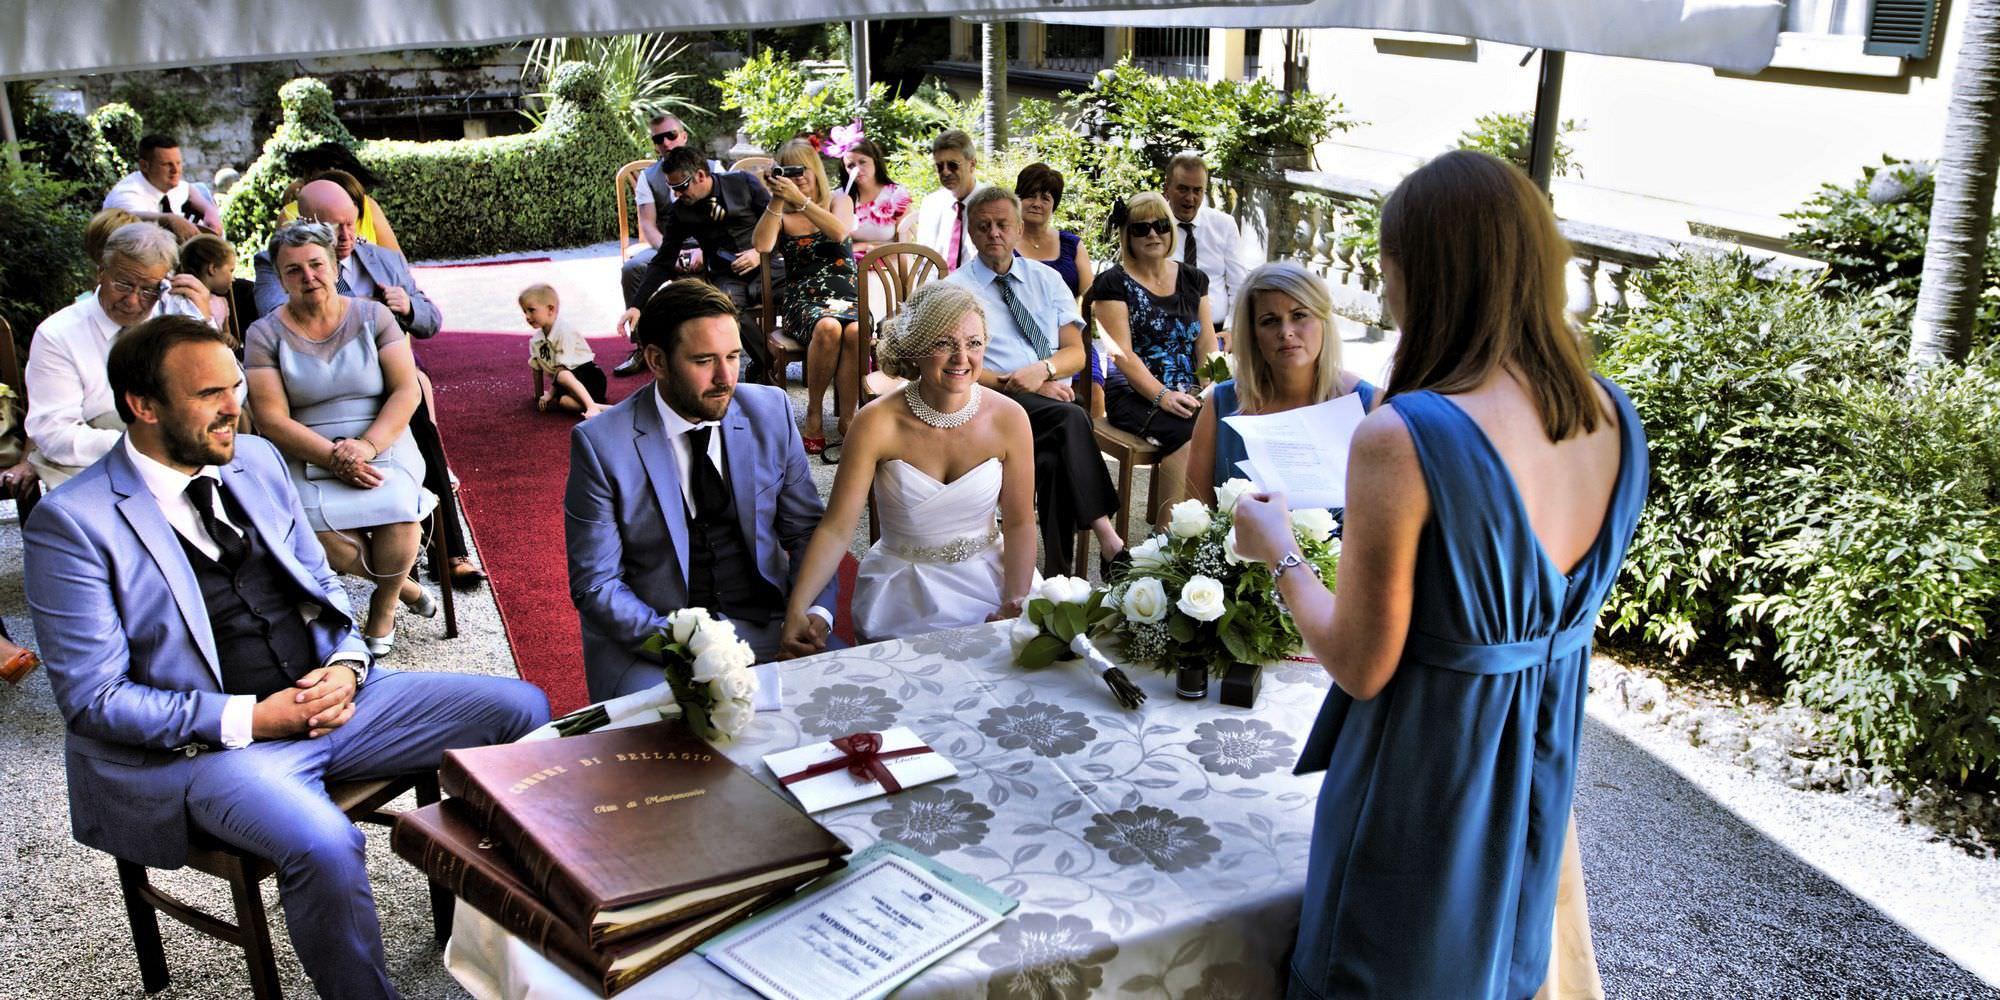 Photo Credit: Romeo & Juliet Weddings